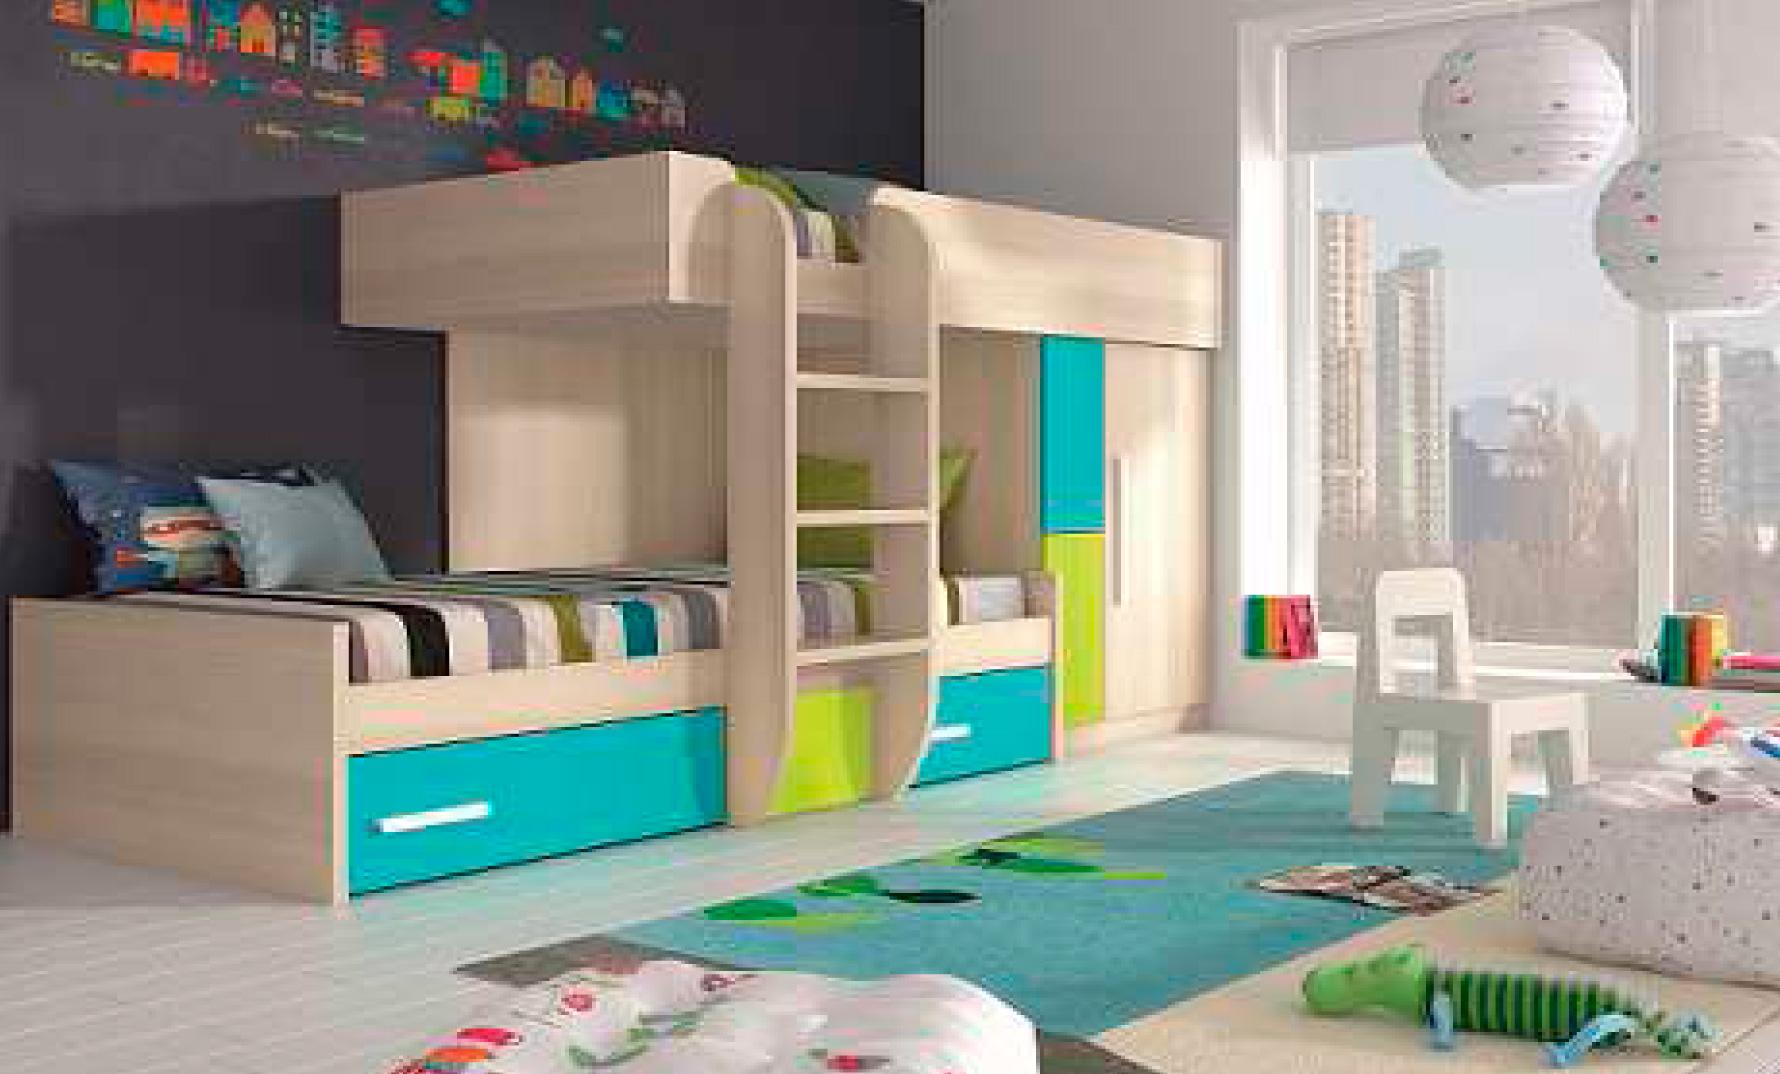 Dormitorio Juvenil Enjoy2 Dormitorios Juveniles Daicarmobel